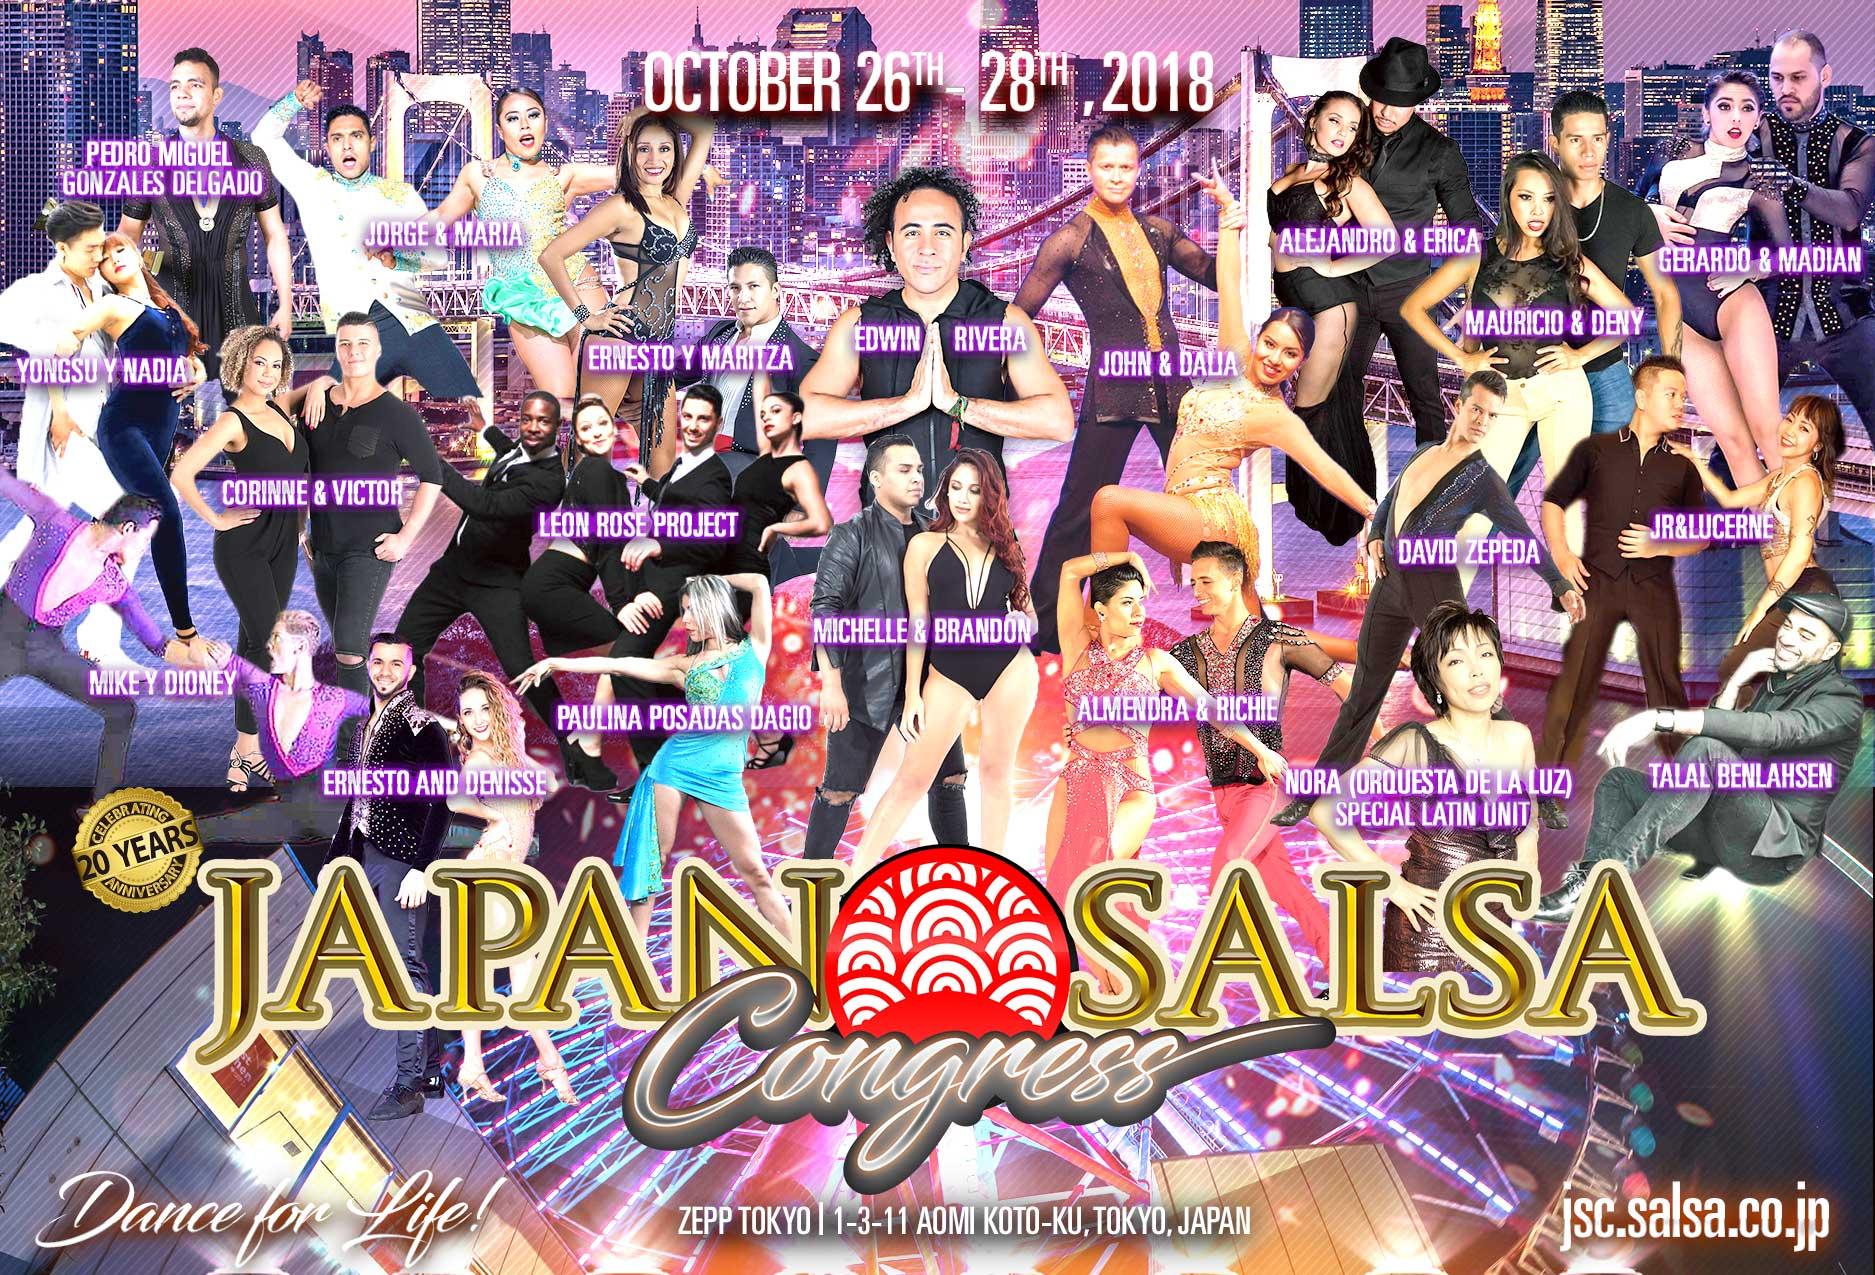 Japan Salsa Congress 2018 出演規約発表 フルパスor1dayが選べる!お得な早割制度あり!!